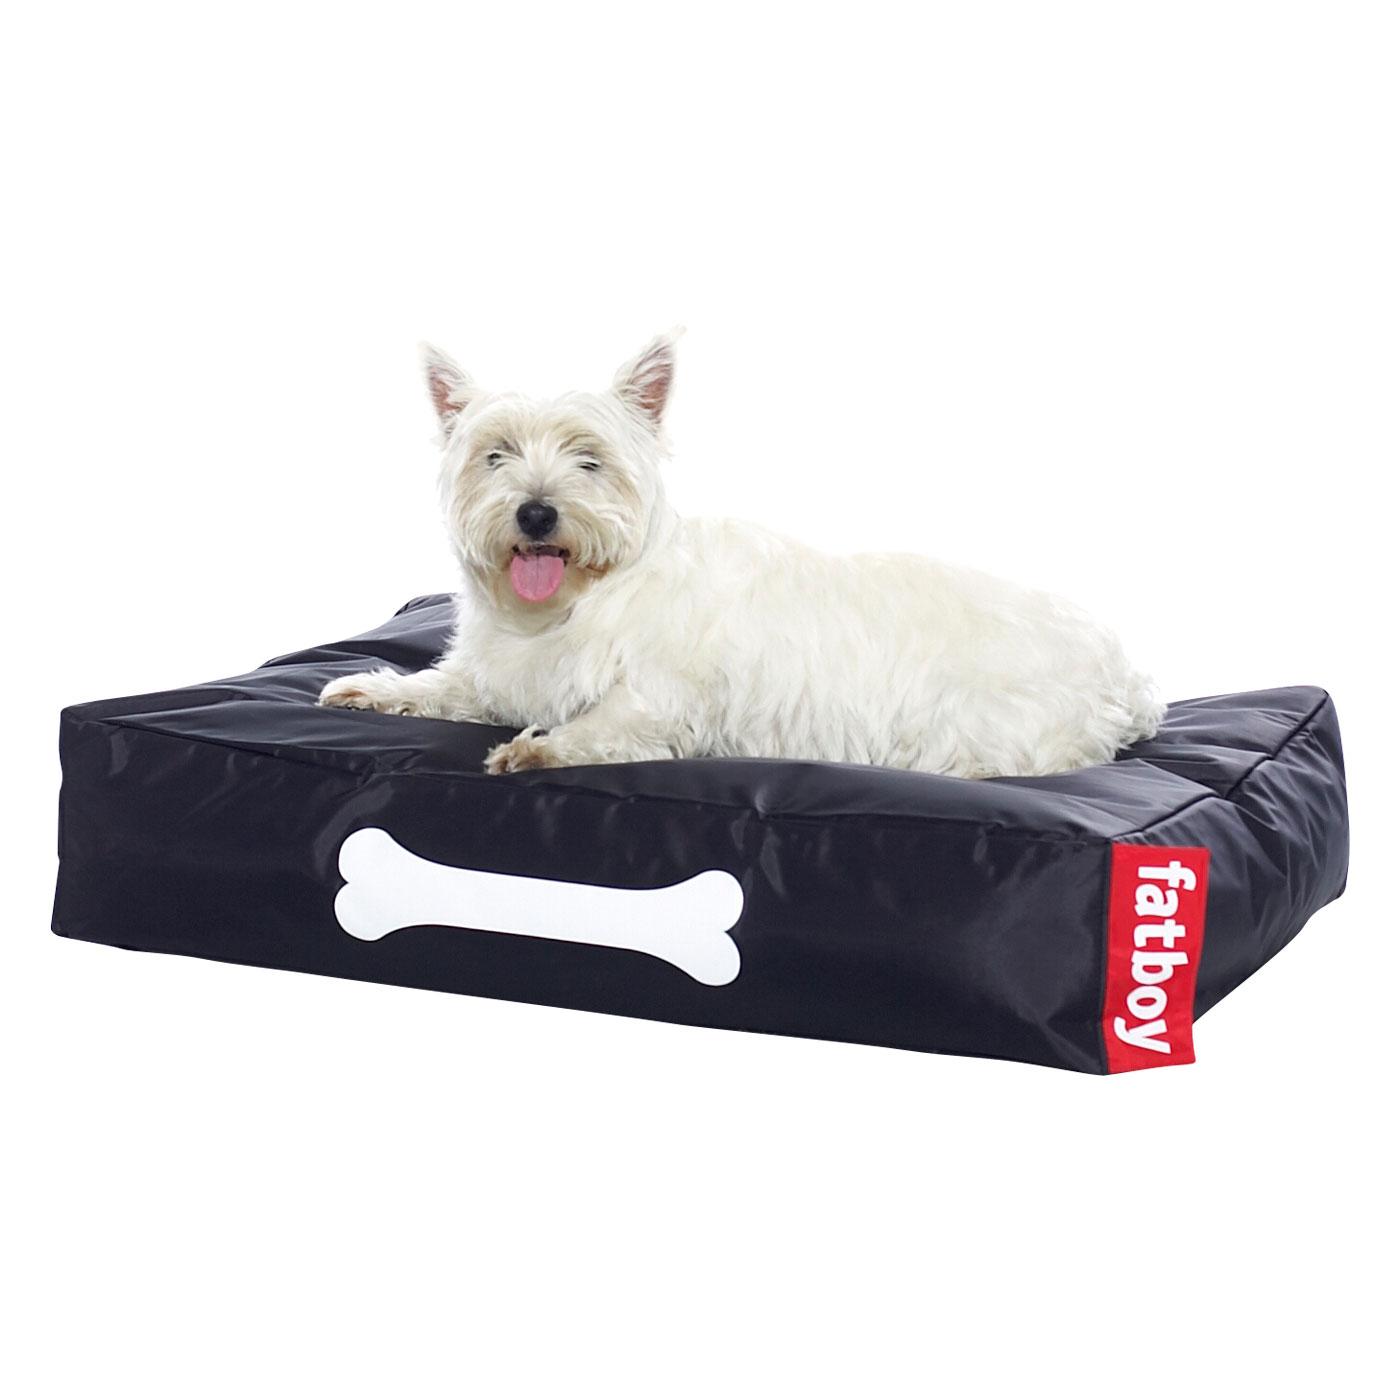 katalog ledsagare doggy stil